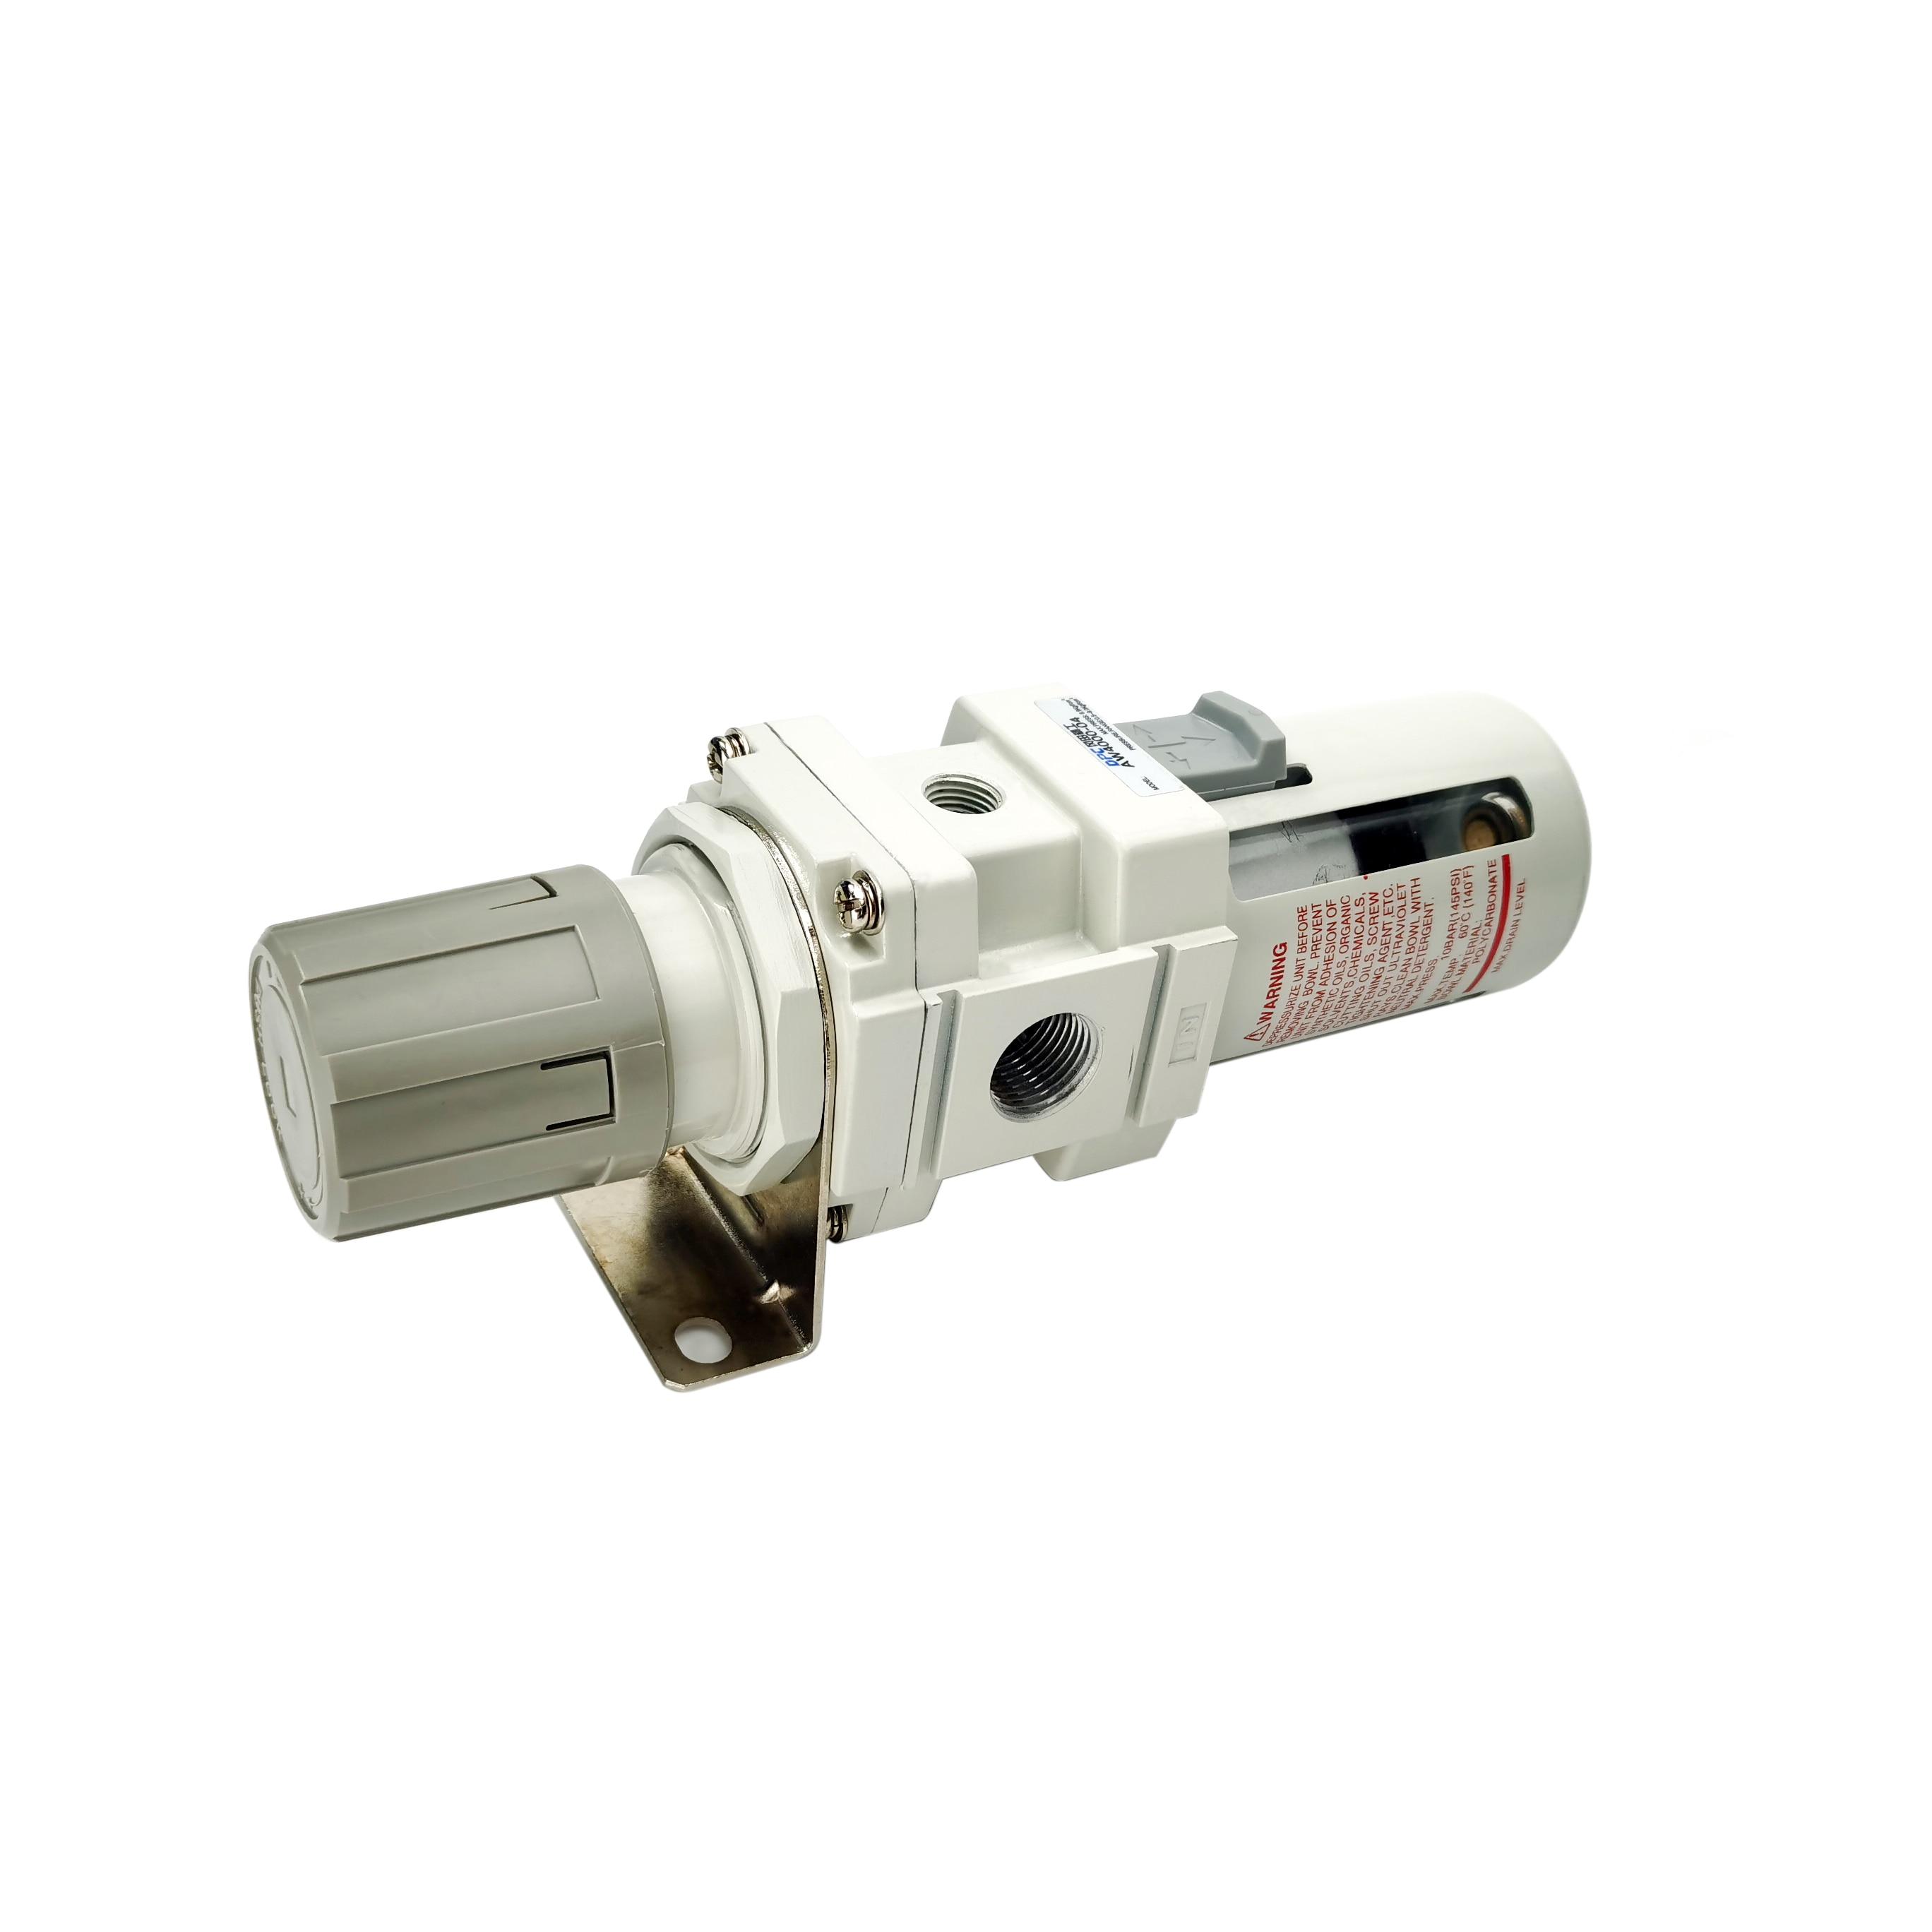 AW5000-06 AW5000-10 AW4000-04 AW4000-06 الهواء النفط المياه المفرق تحكم هوائي منظم ضغط ضاغط فلتر